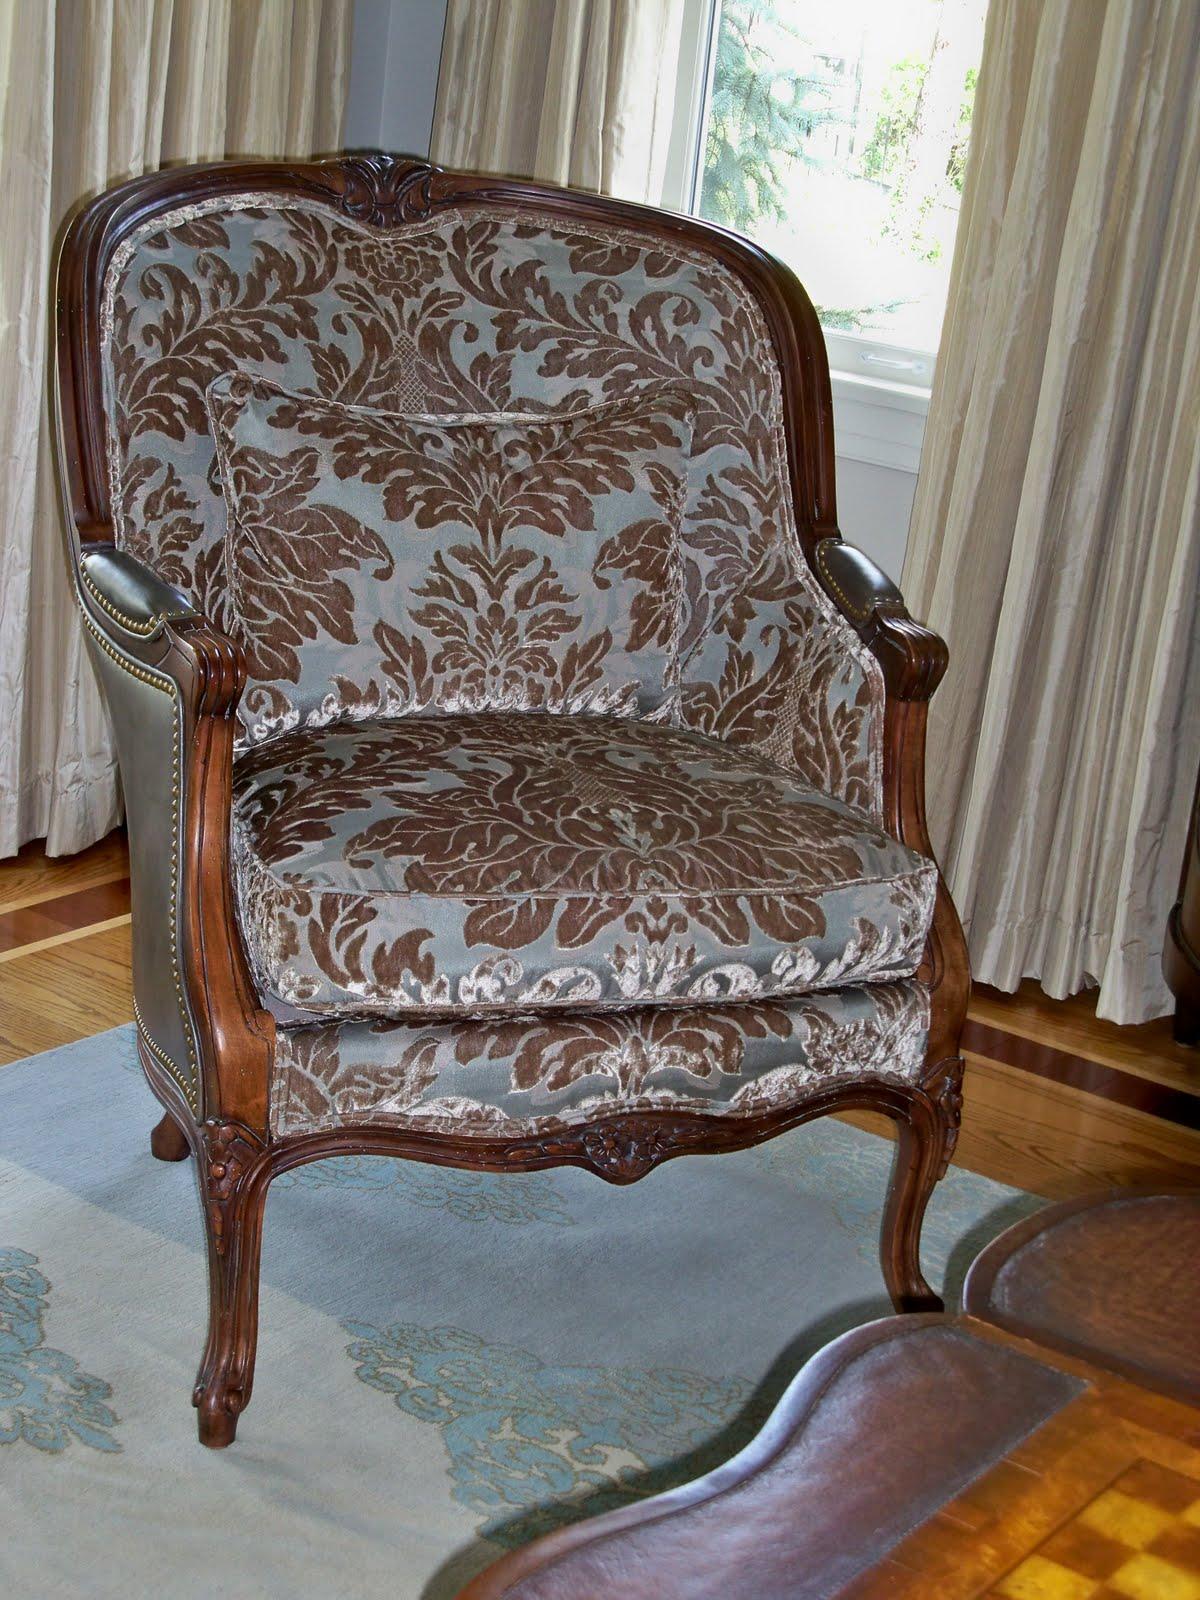 Isaac Mizrahi Dining Chairs Swiss Lark Moving Sale Ordinary Isaac Mizrahi Furniture The